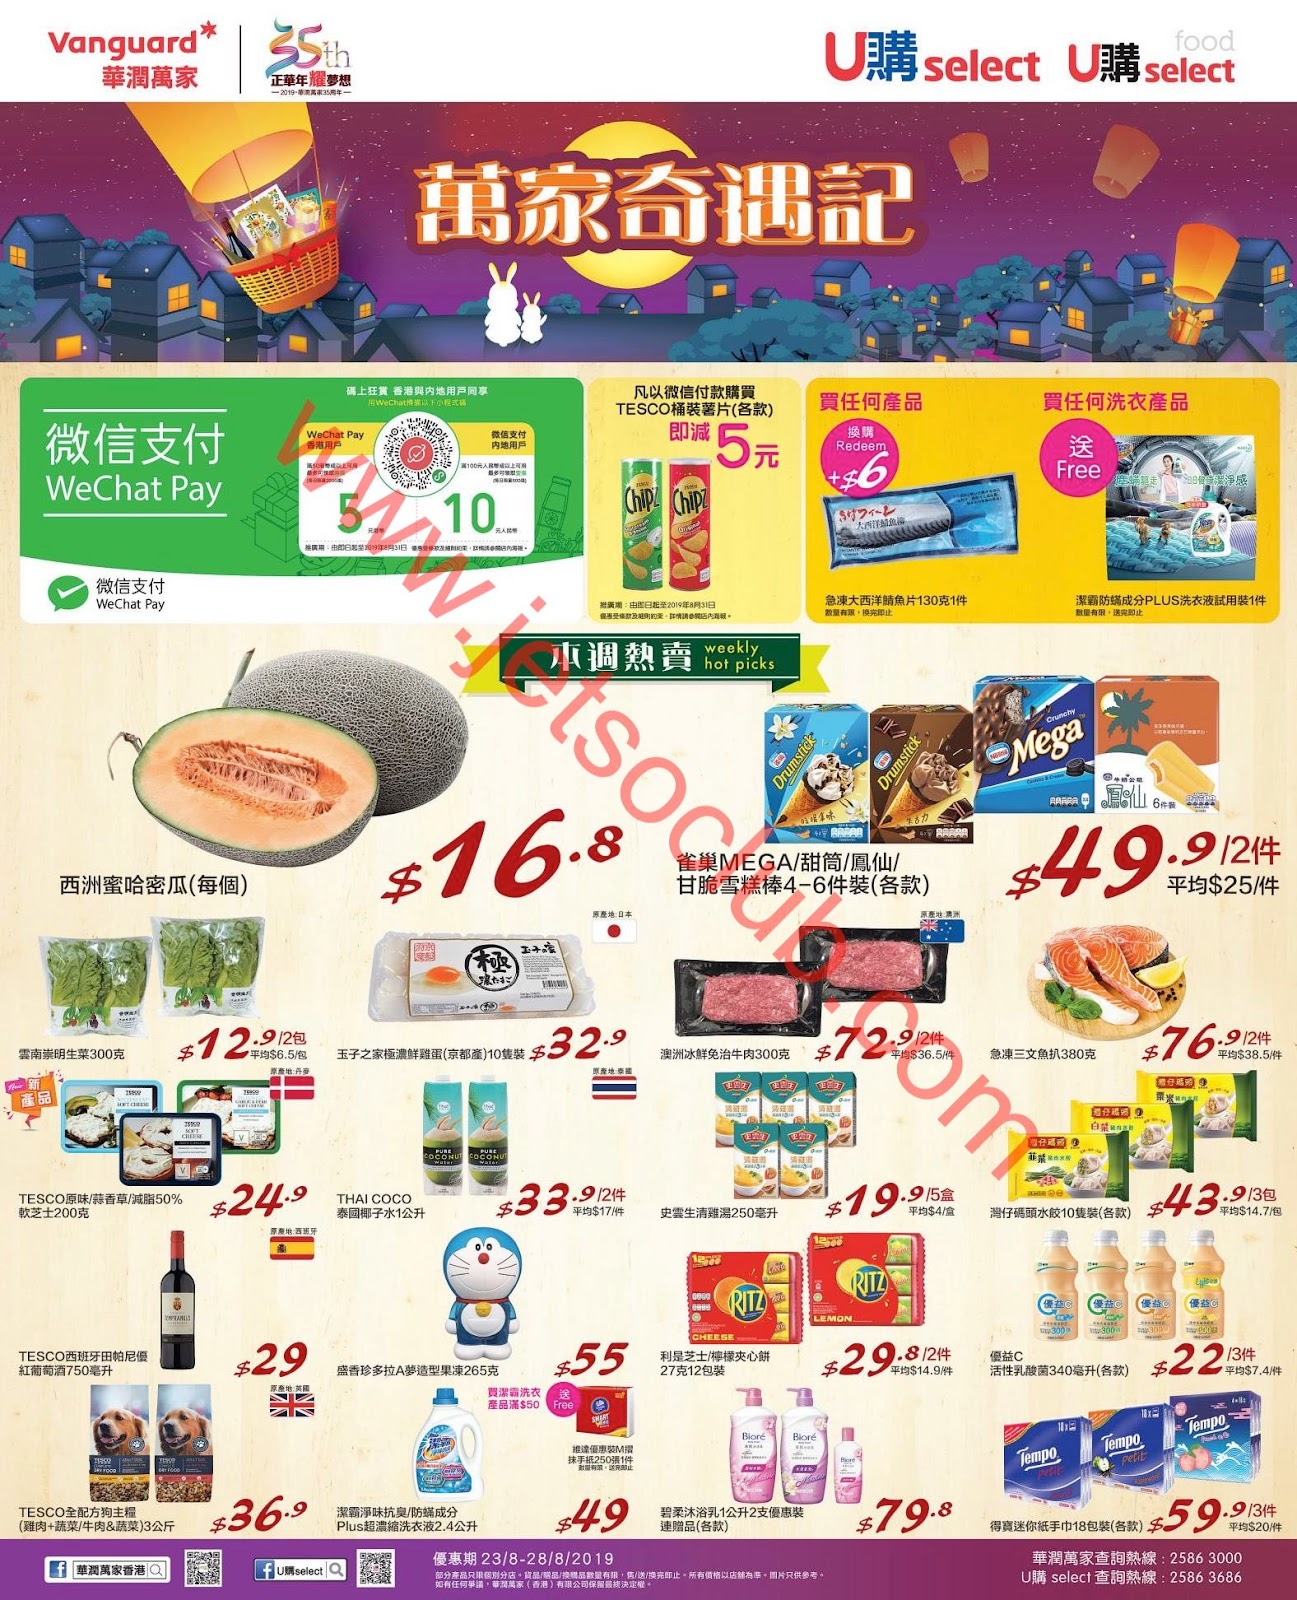 U購 select / 華潤萬家超級市場最新優惠(23/8) ( Jetso Club 著數俱樂部 )